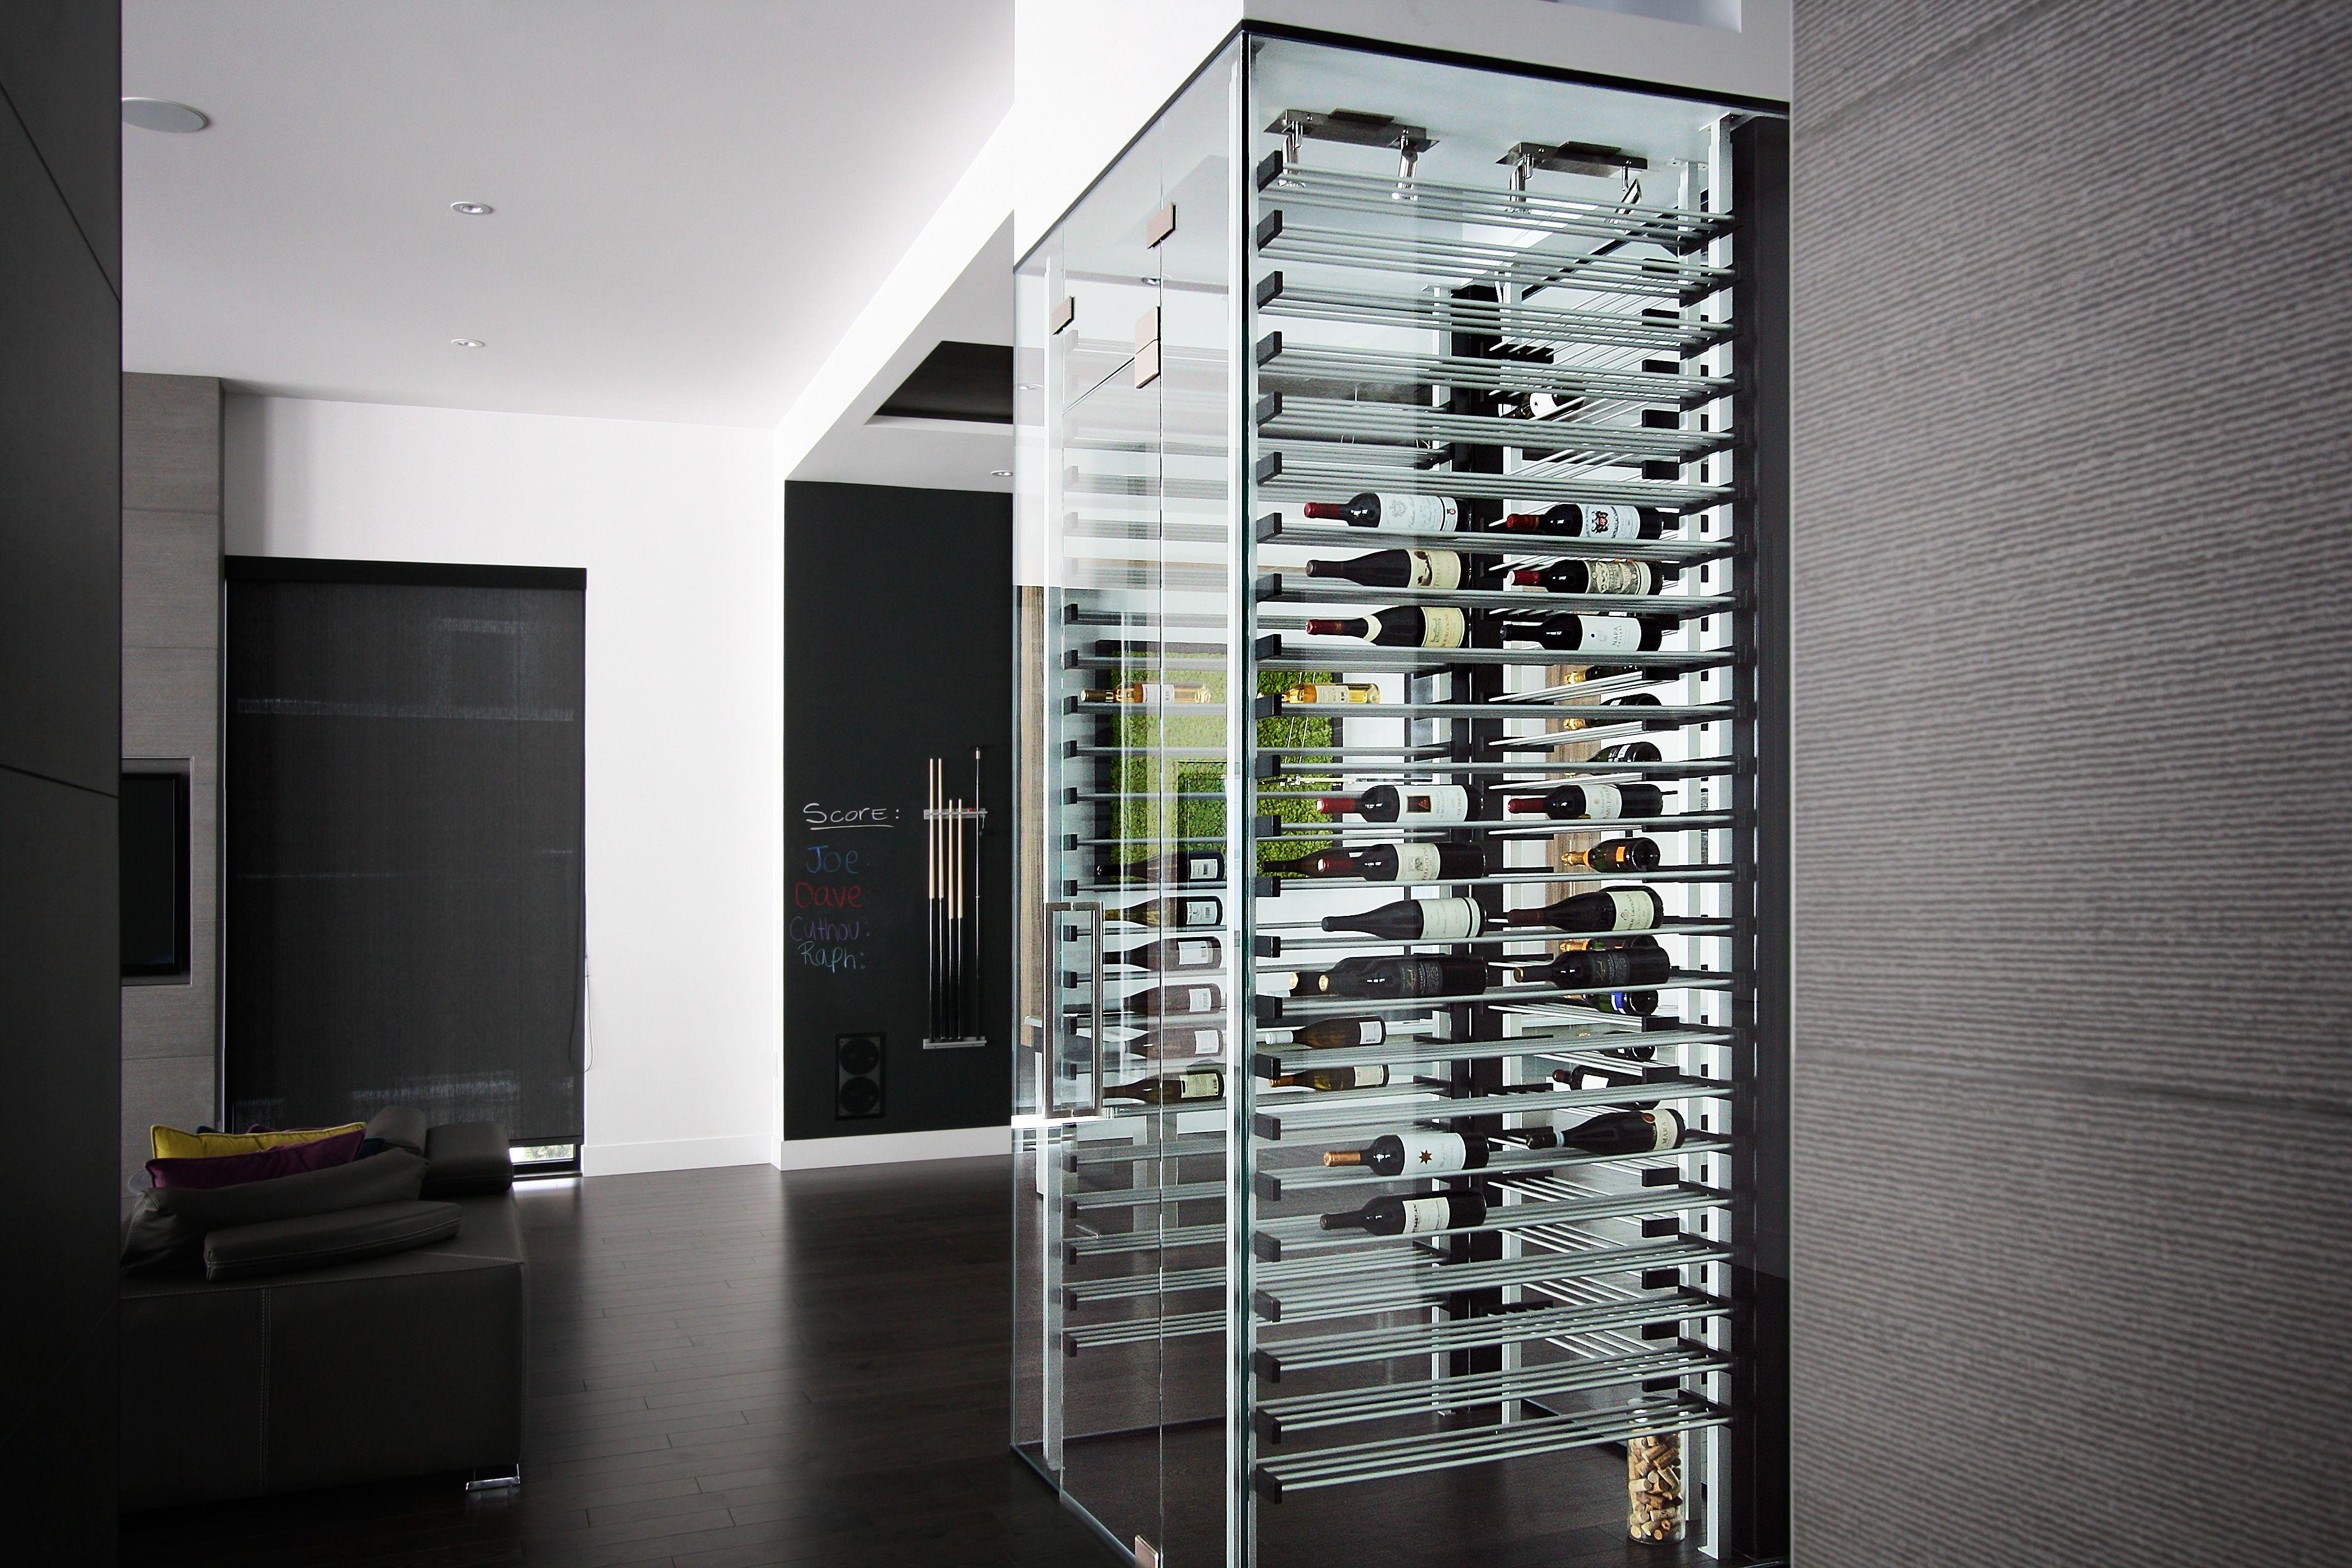 Rangement Cave à Vin contemporain | Glass wine cellar, Wine cellar, Wine wall